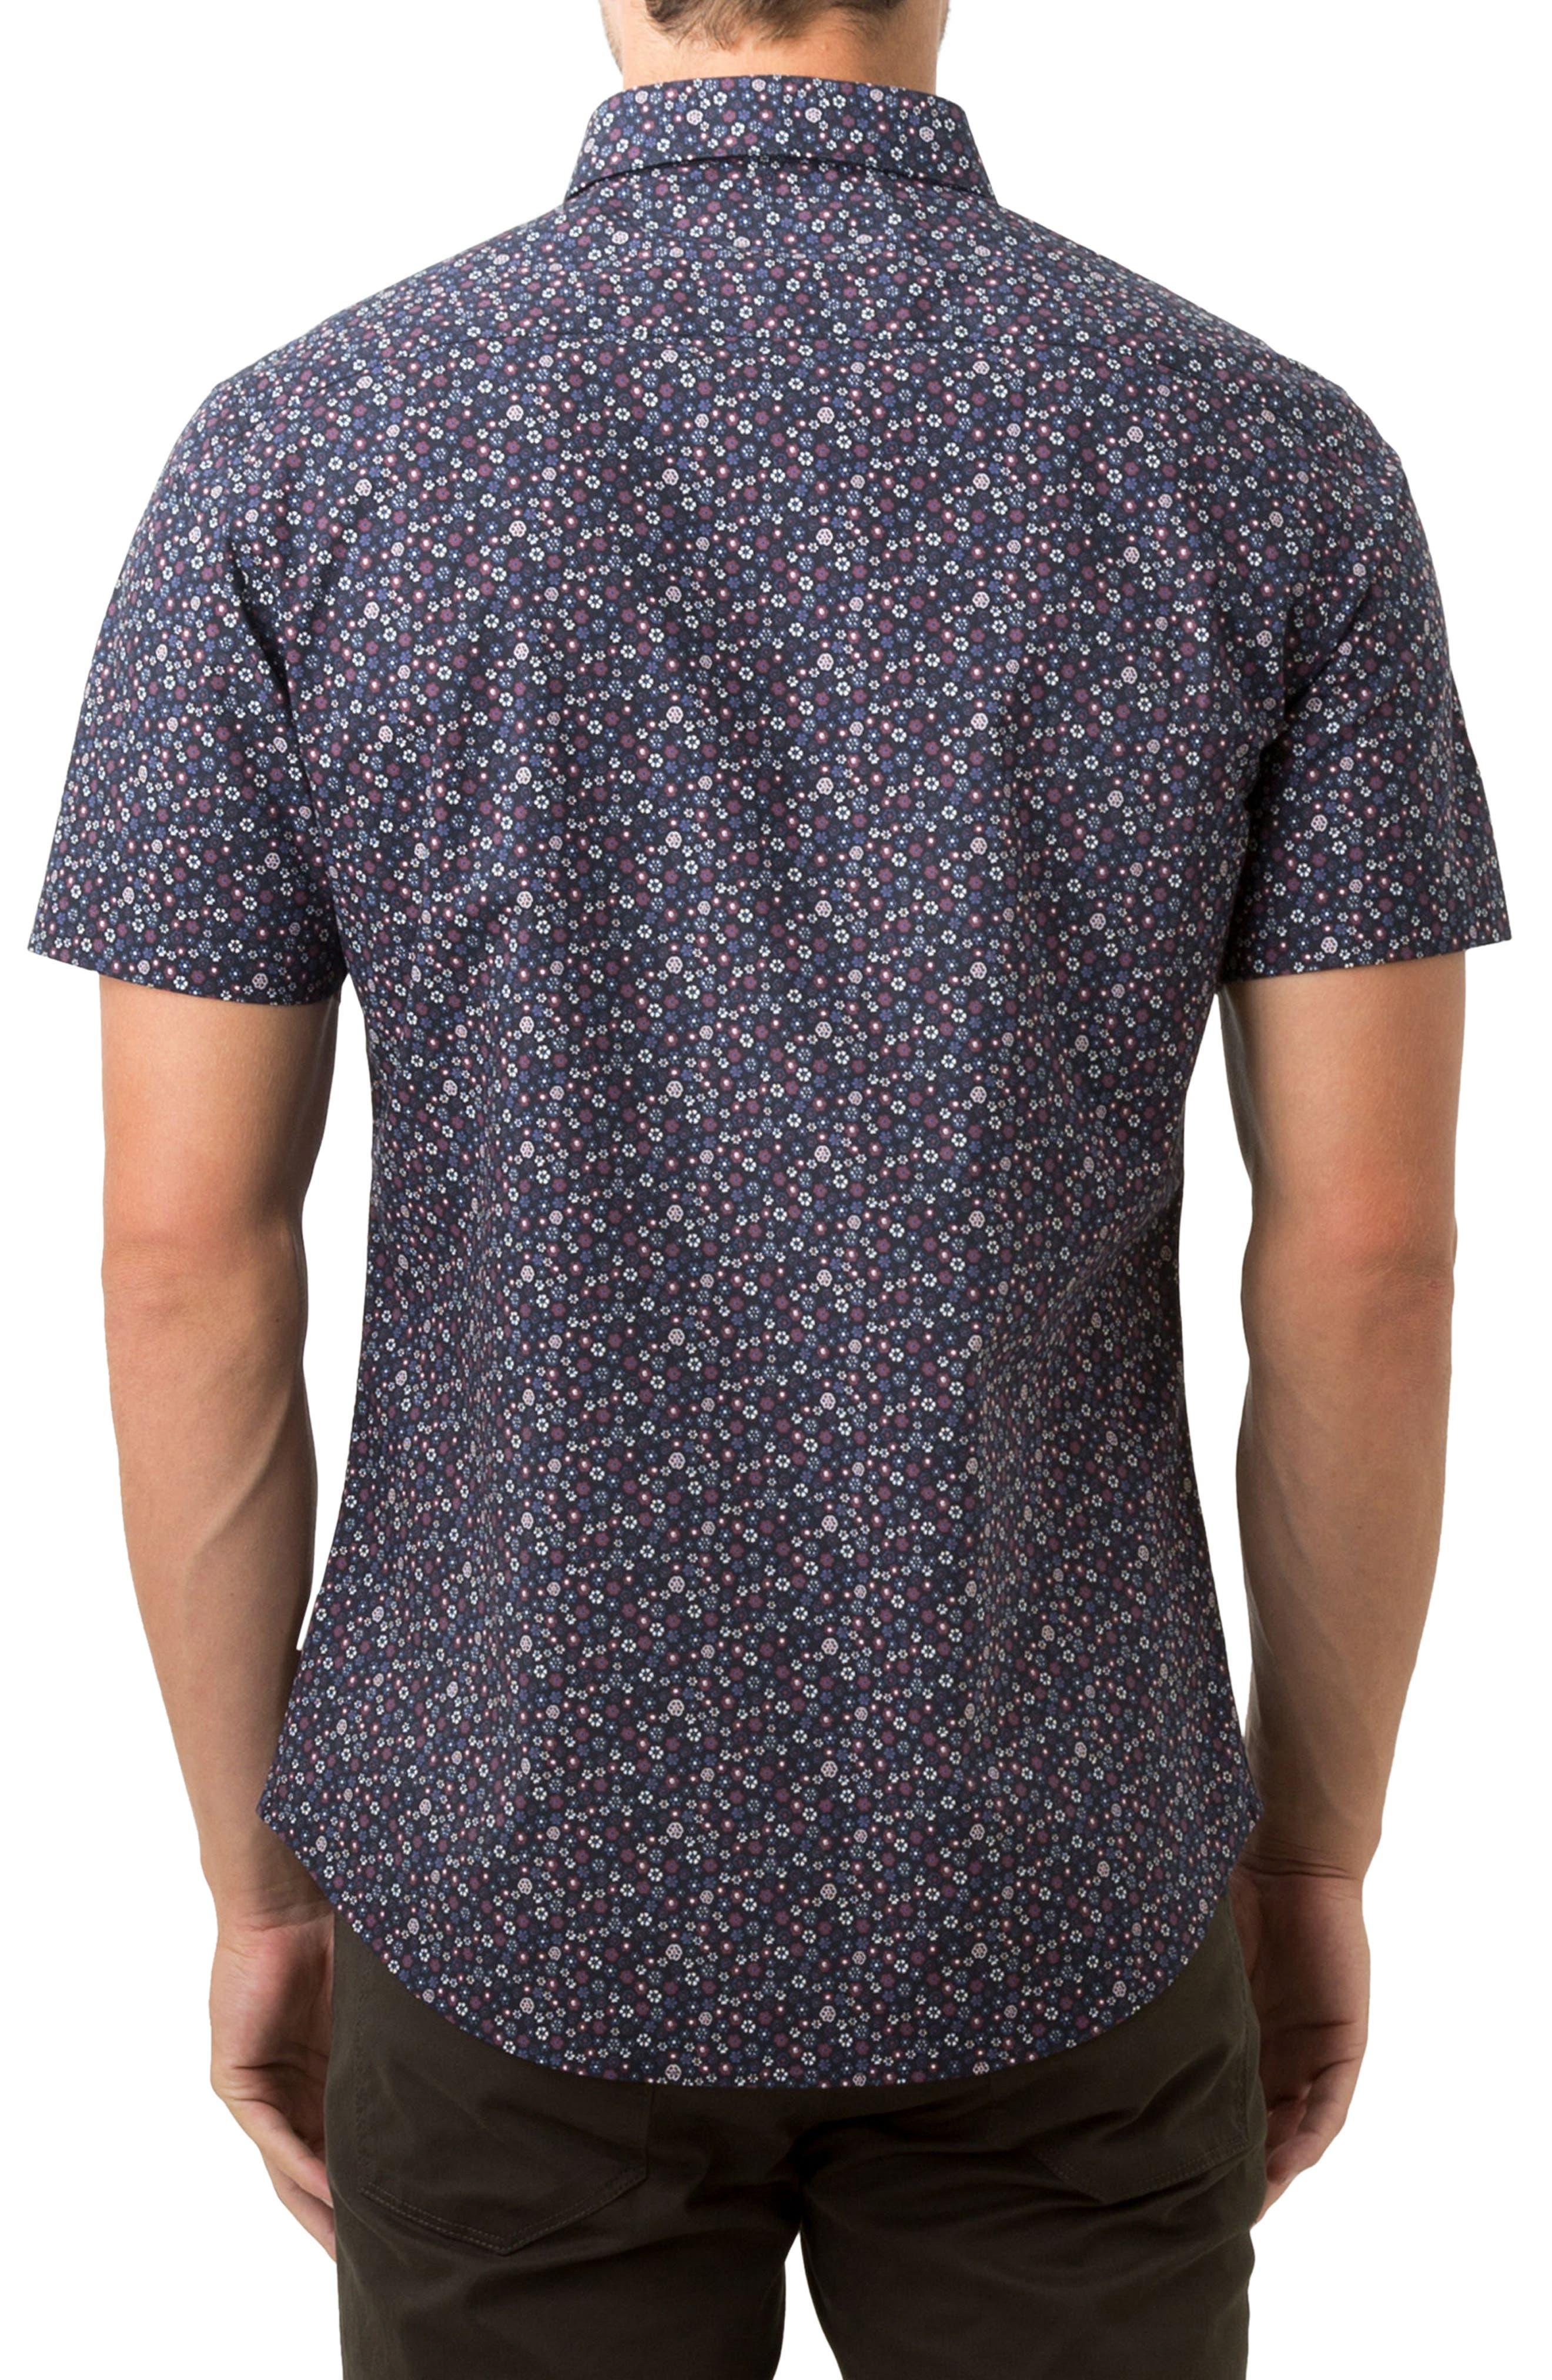 Pure Luck Woven Shirt,                             Alternate thumbnail 2, color,